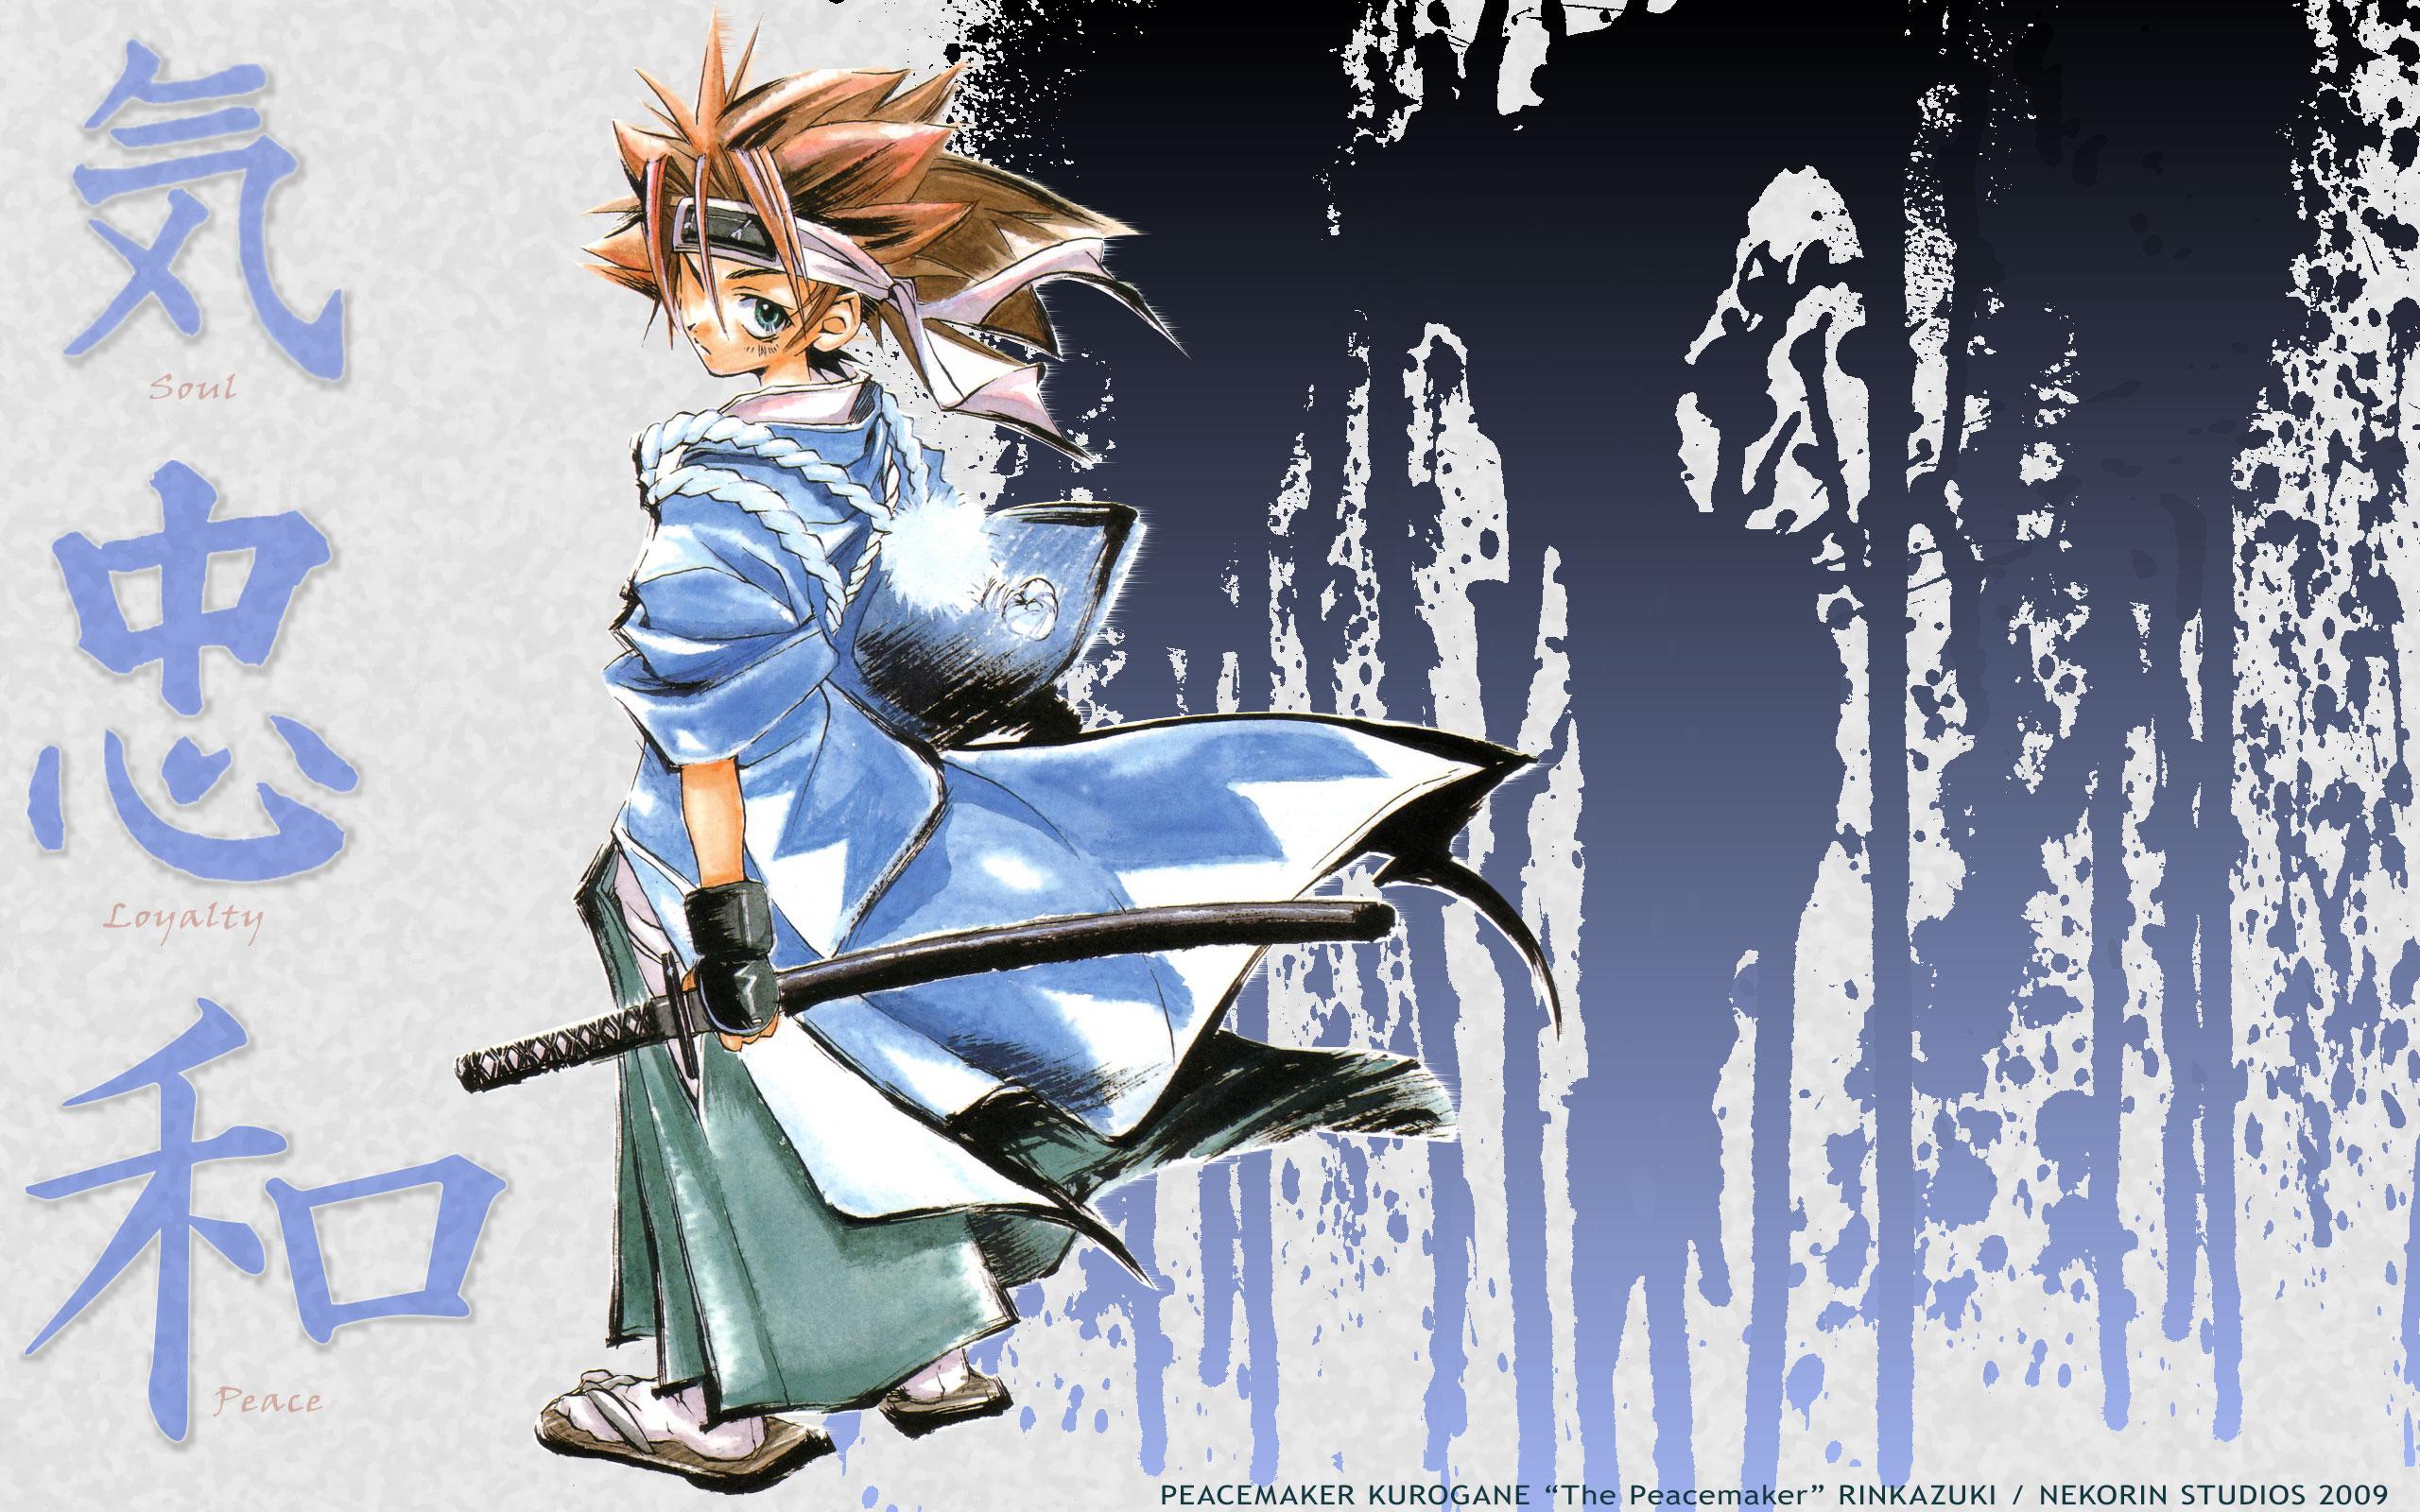 tags anime chrono nanae peace maker kurogane ichimura tetsunosuke 2560x1600 wallpaper